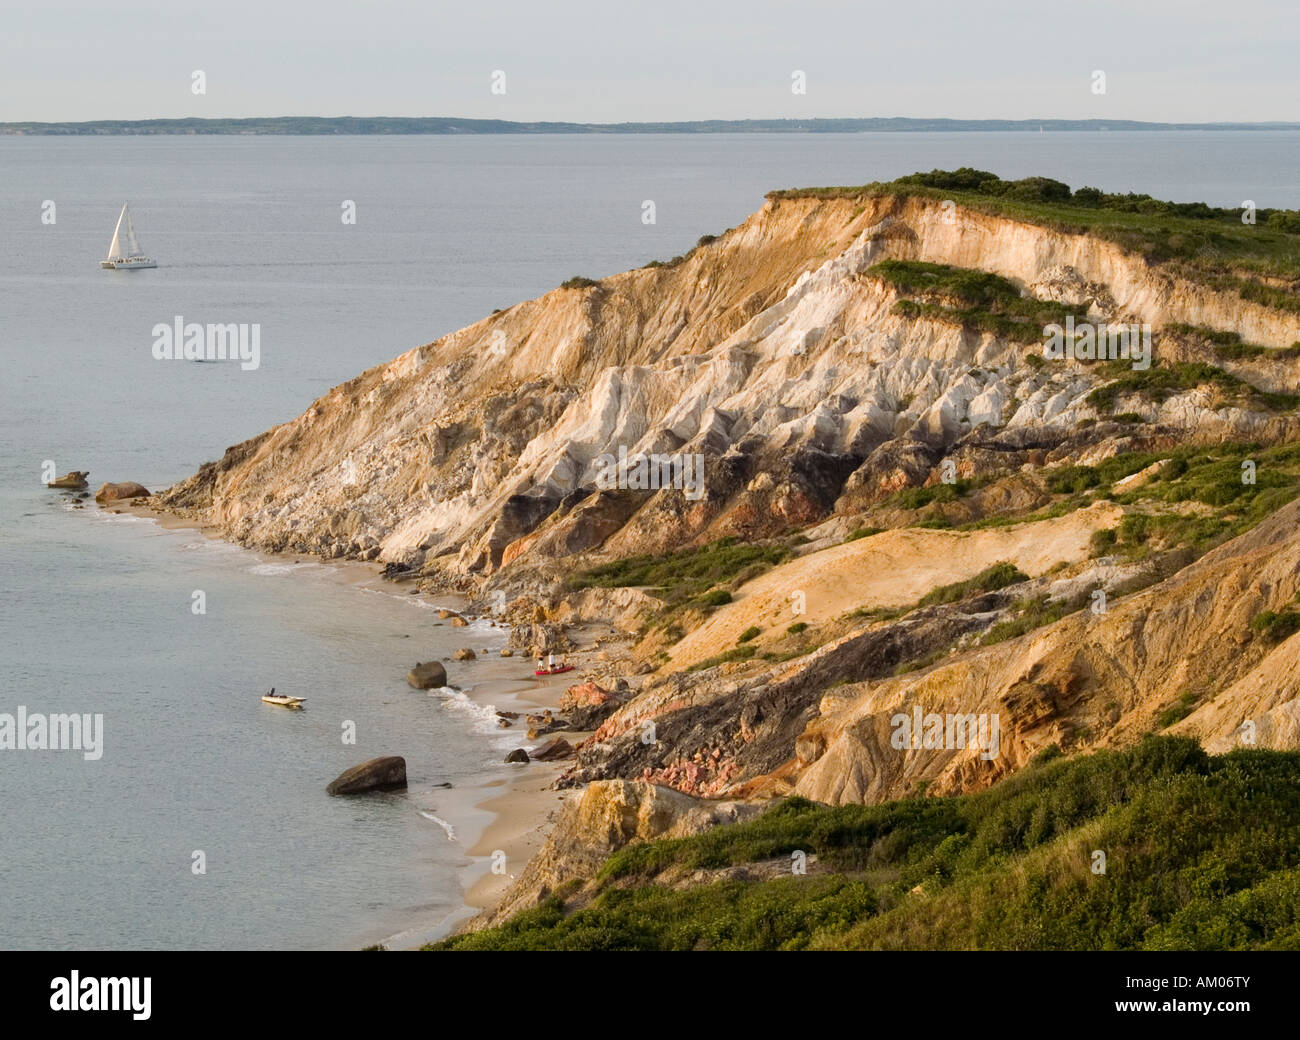 Gay Head Cliffs Aquinnah Marthas Vineyard Gorgeous | Etsy